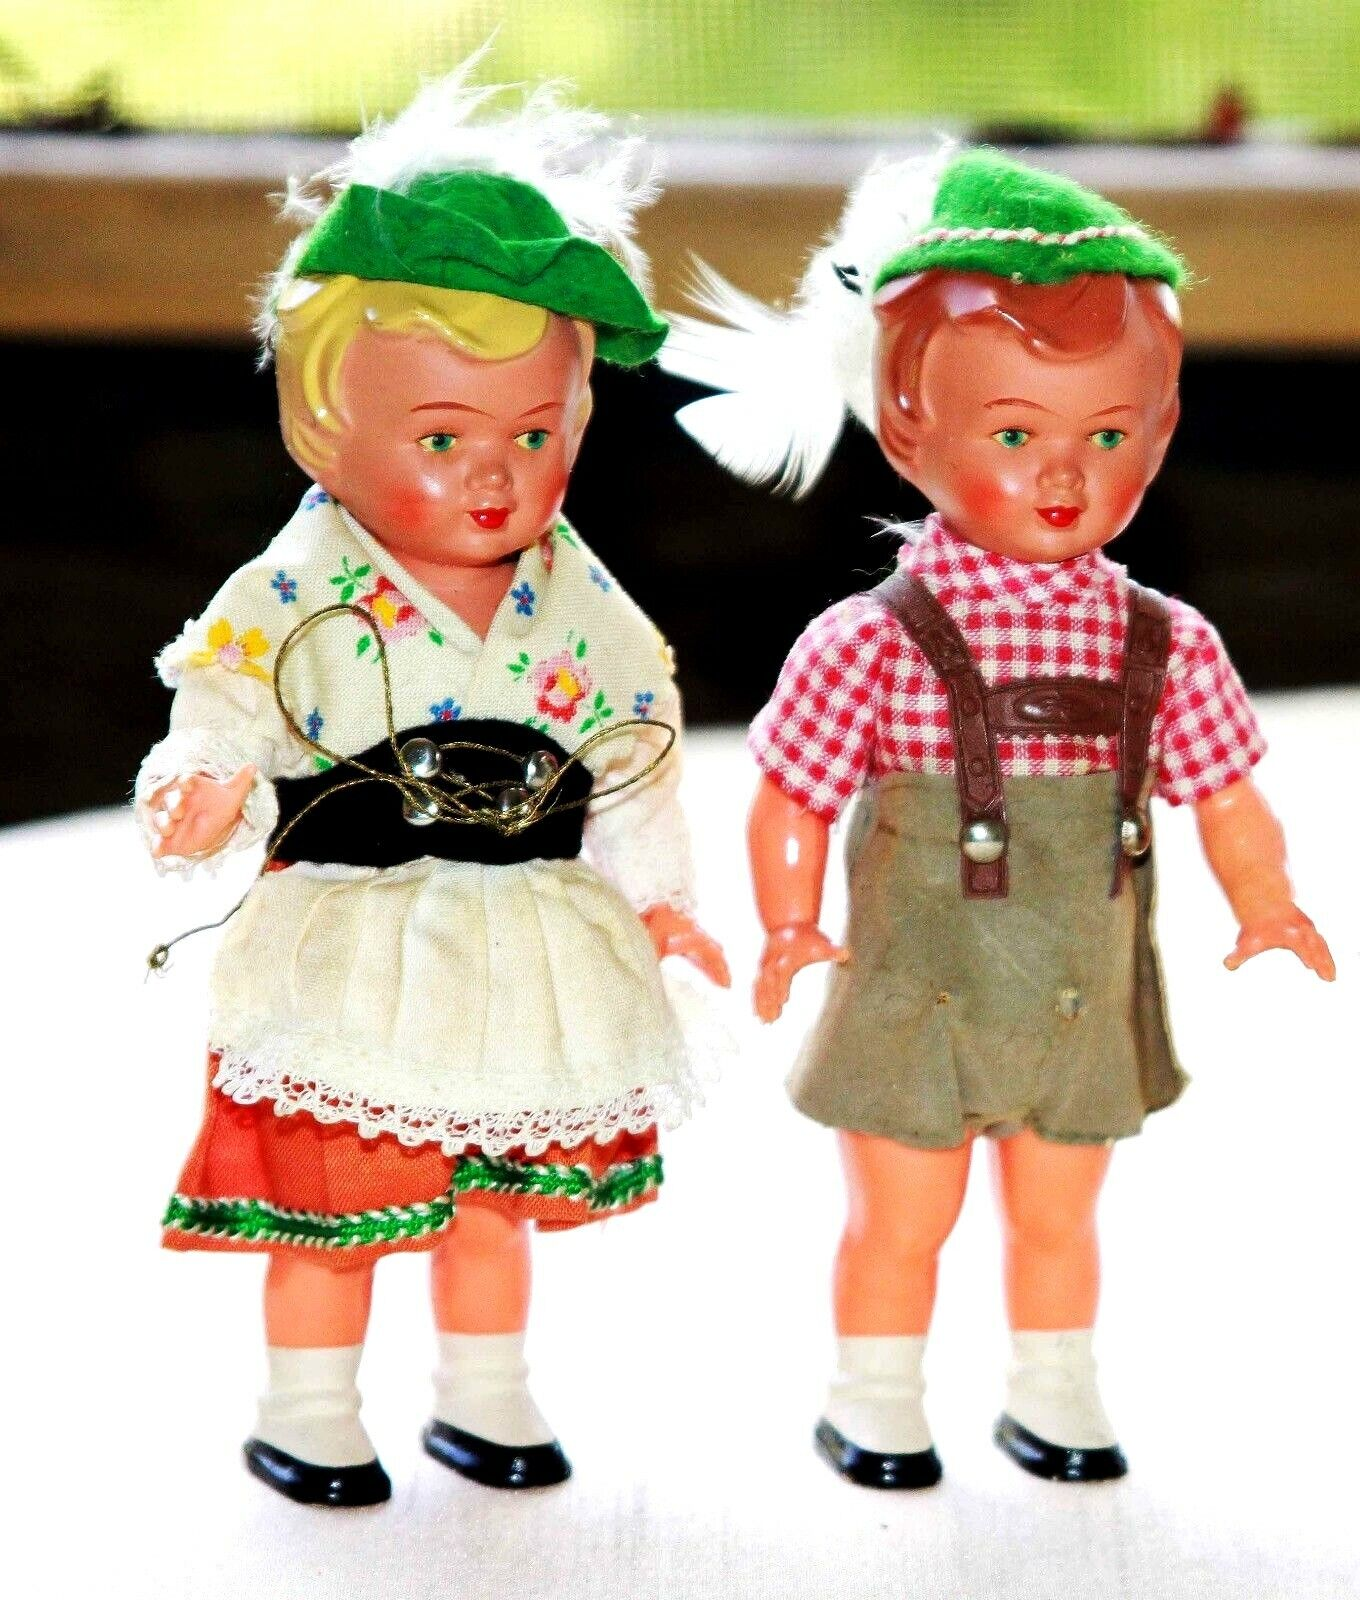 2 ANTIQUE GERuomo BISQUE bambolaS RAREDRESSED IN TRADITIONAL COSTUME  HARD TO FIND  esclusivo